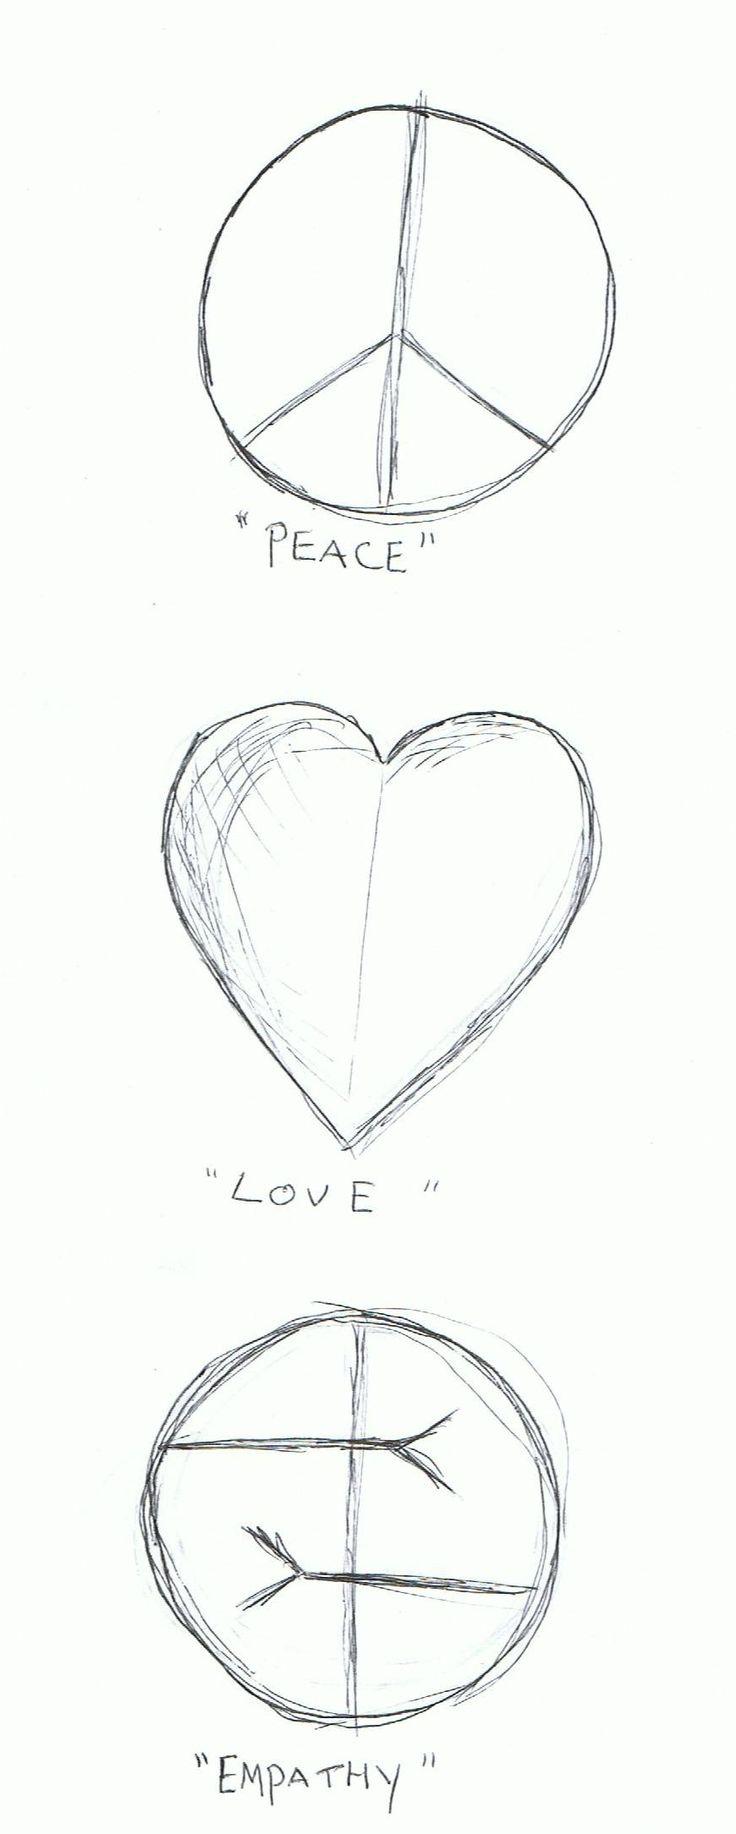 Peace, love, empathy ~ Kurt Cobain